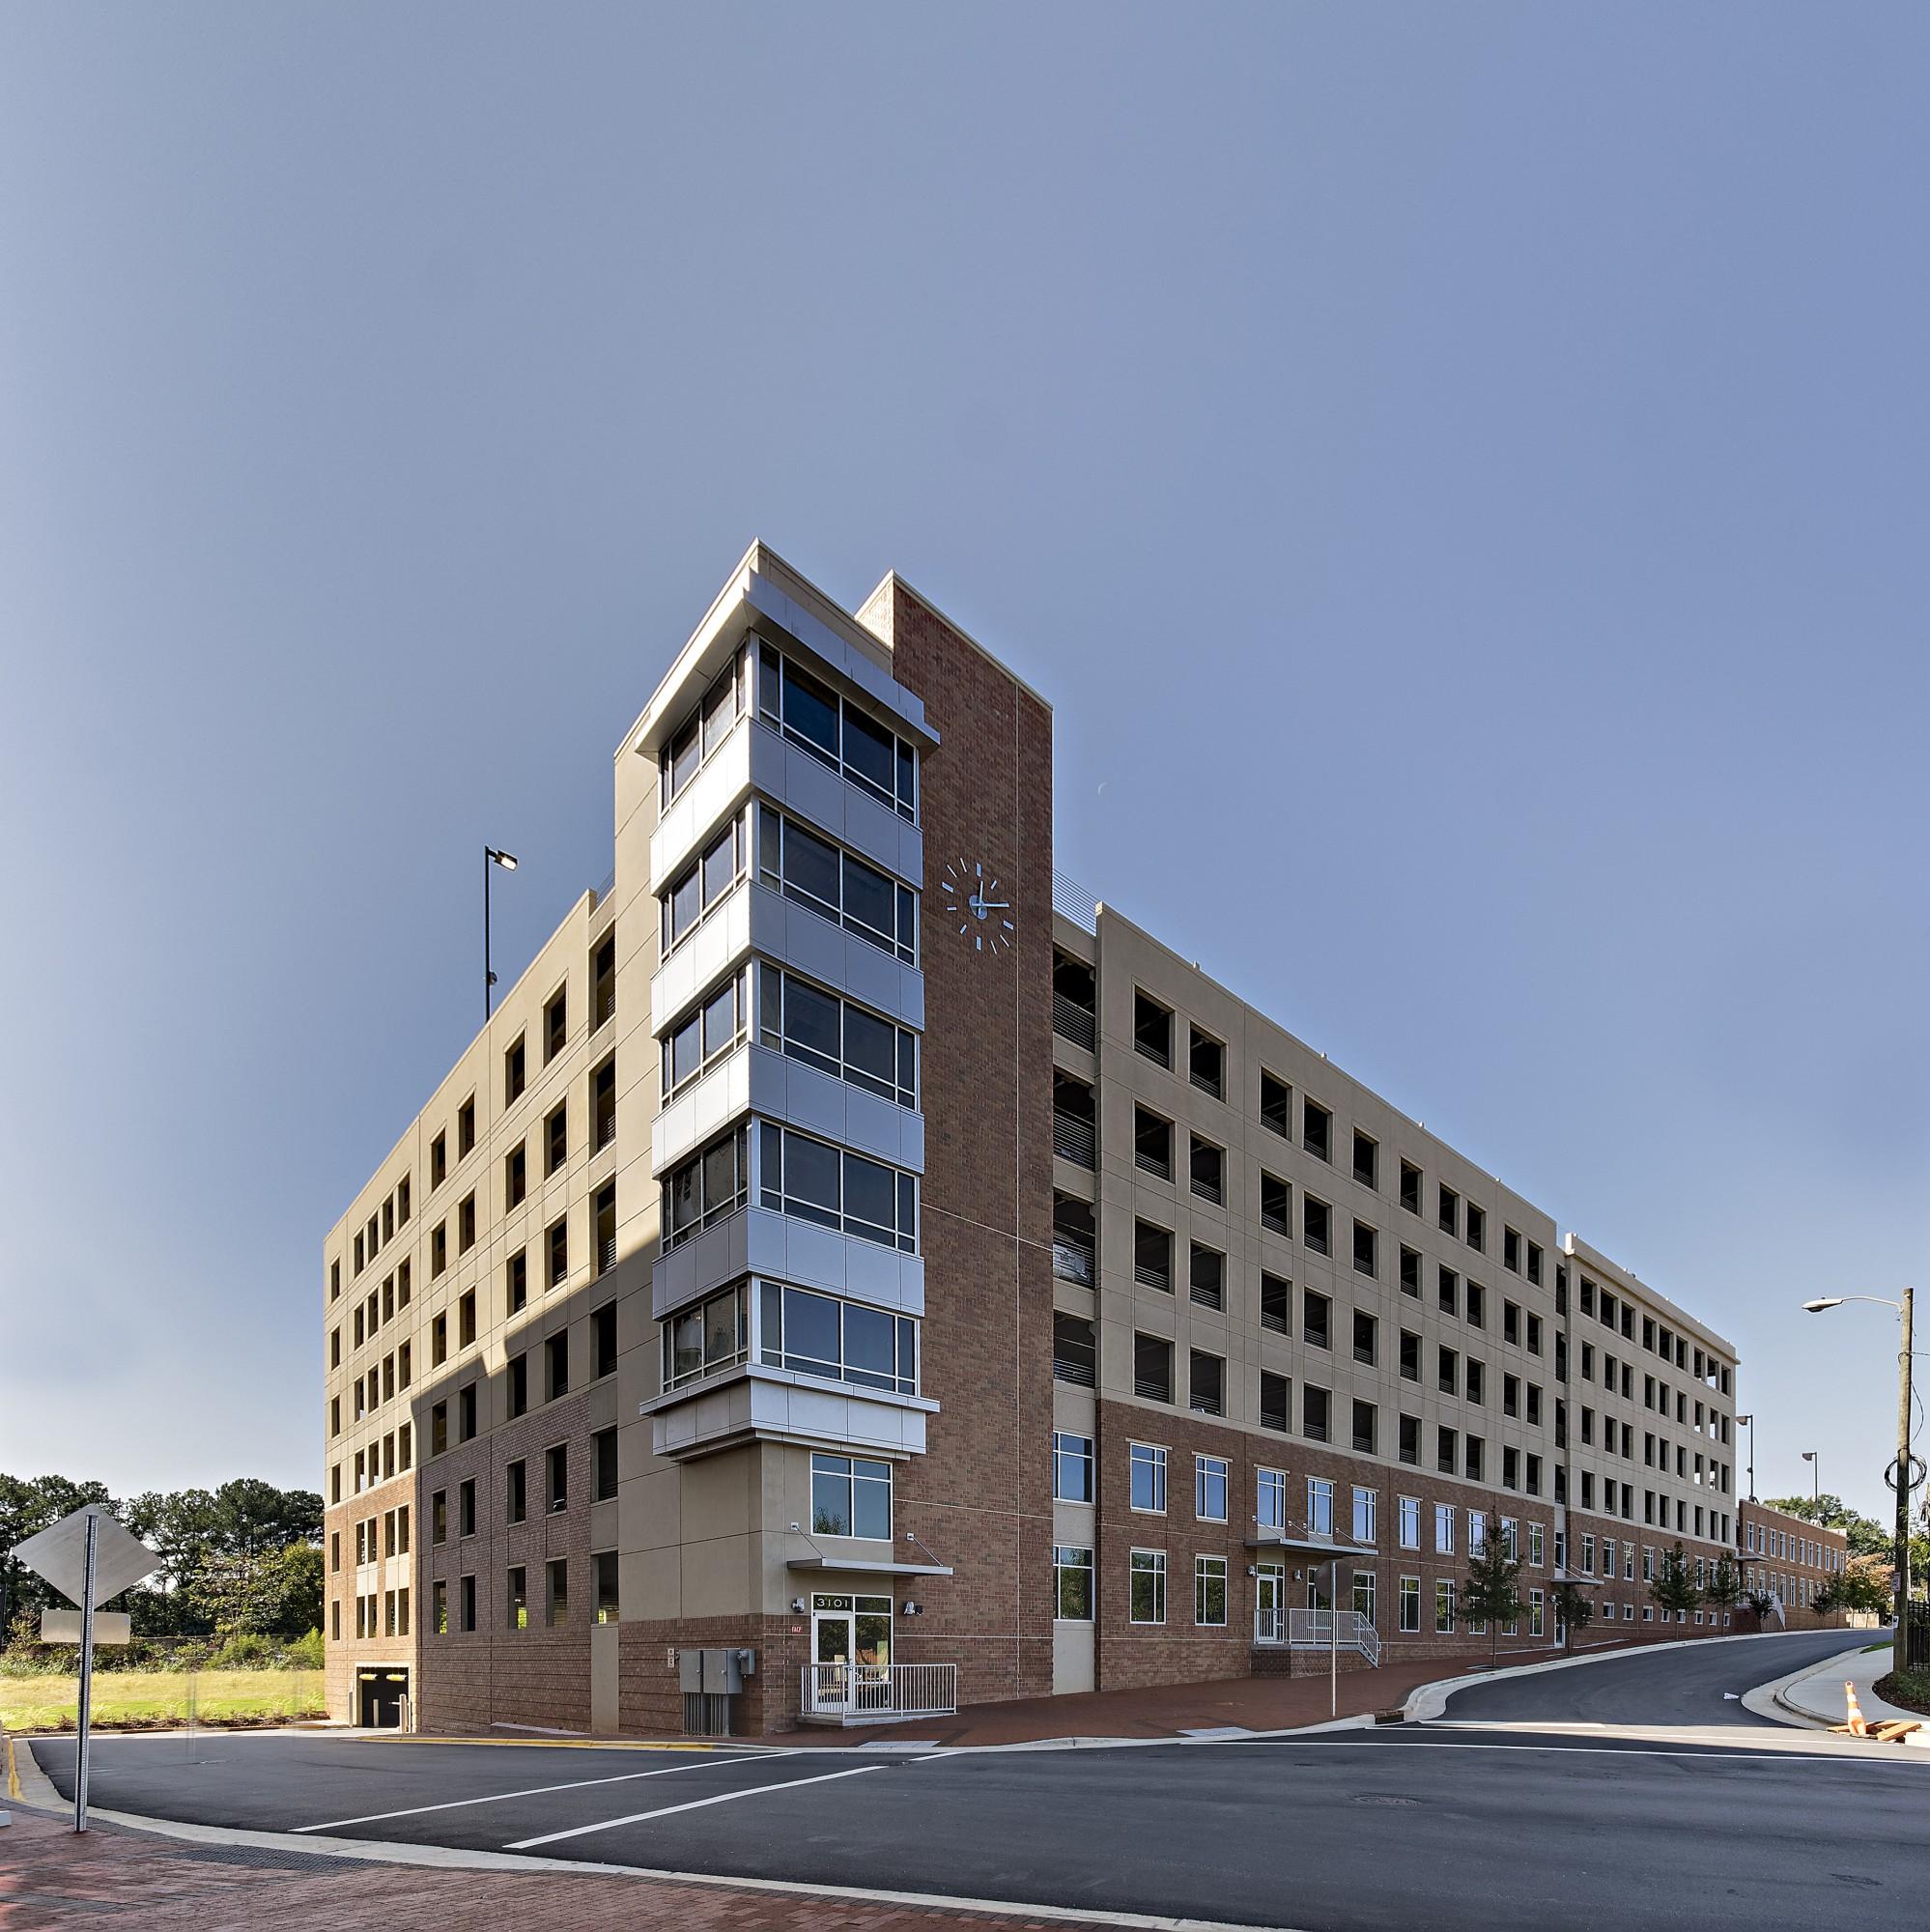 Apartment Store State College: North Carolina State University